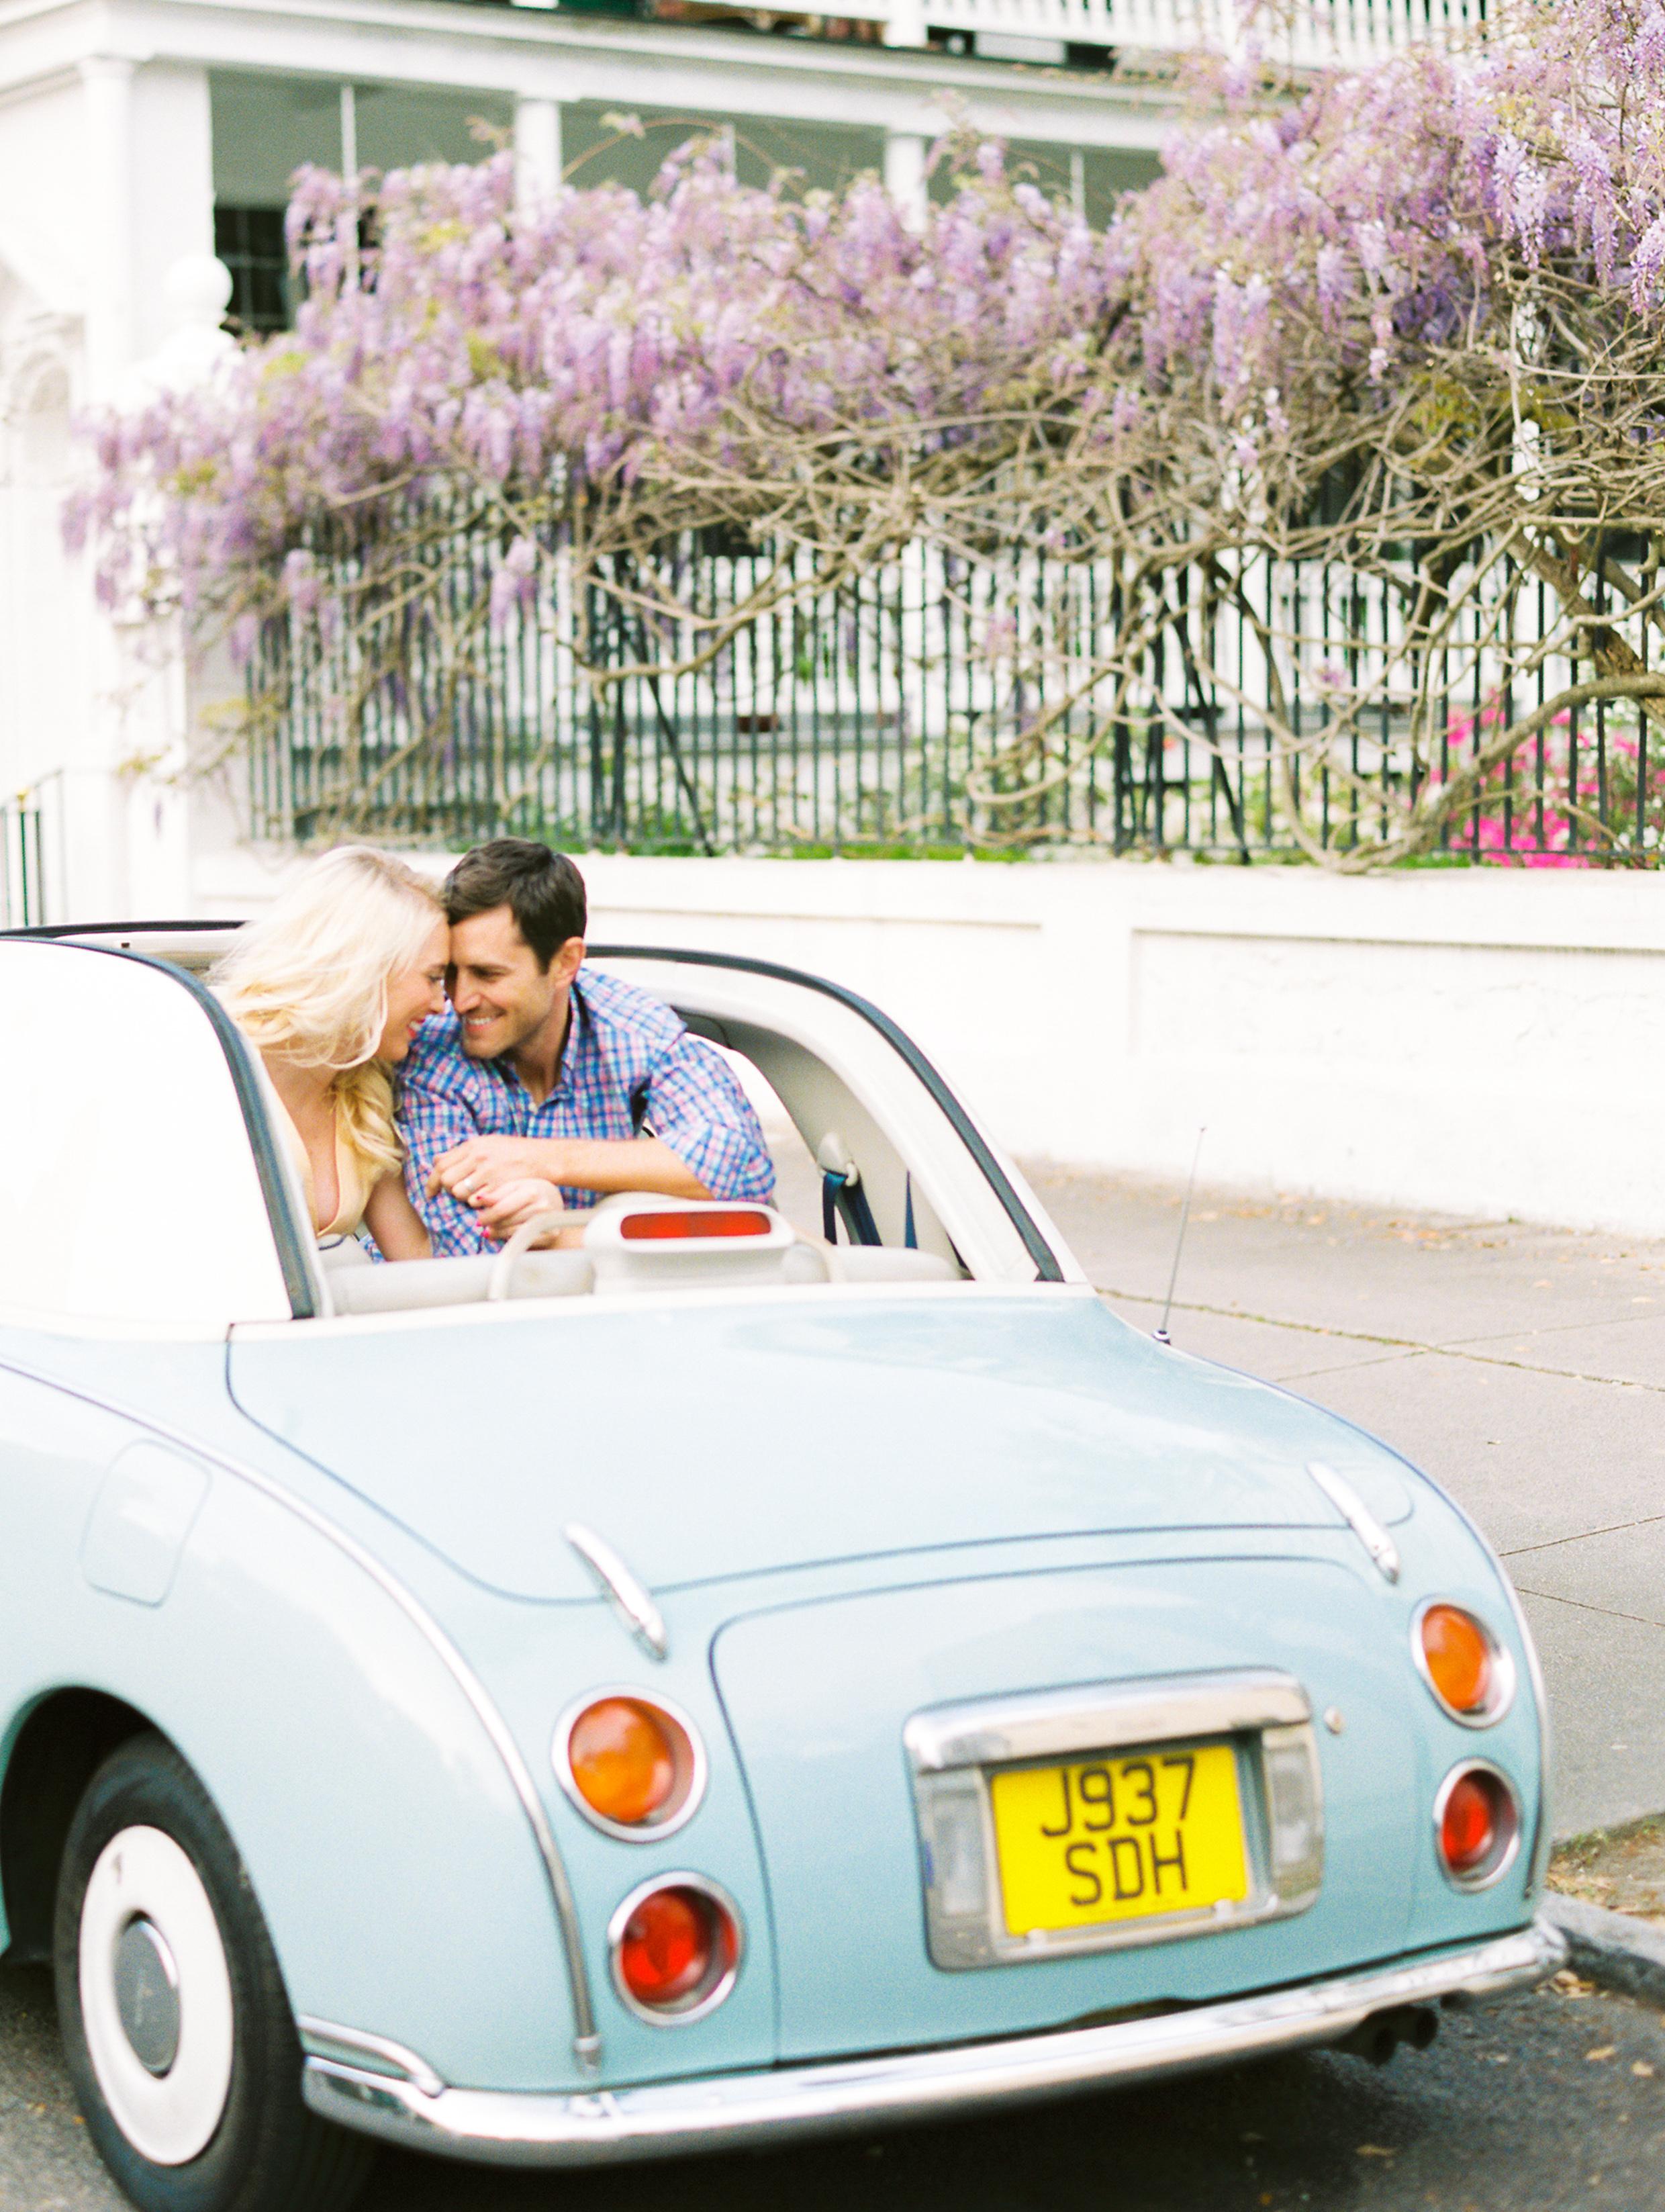 Coastal Bride - Downtown Wisteria Vintage Car Anniversary   Jaime & Erik